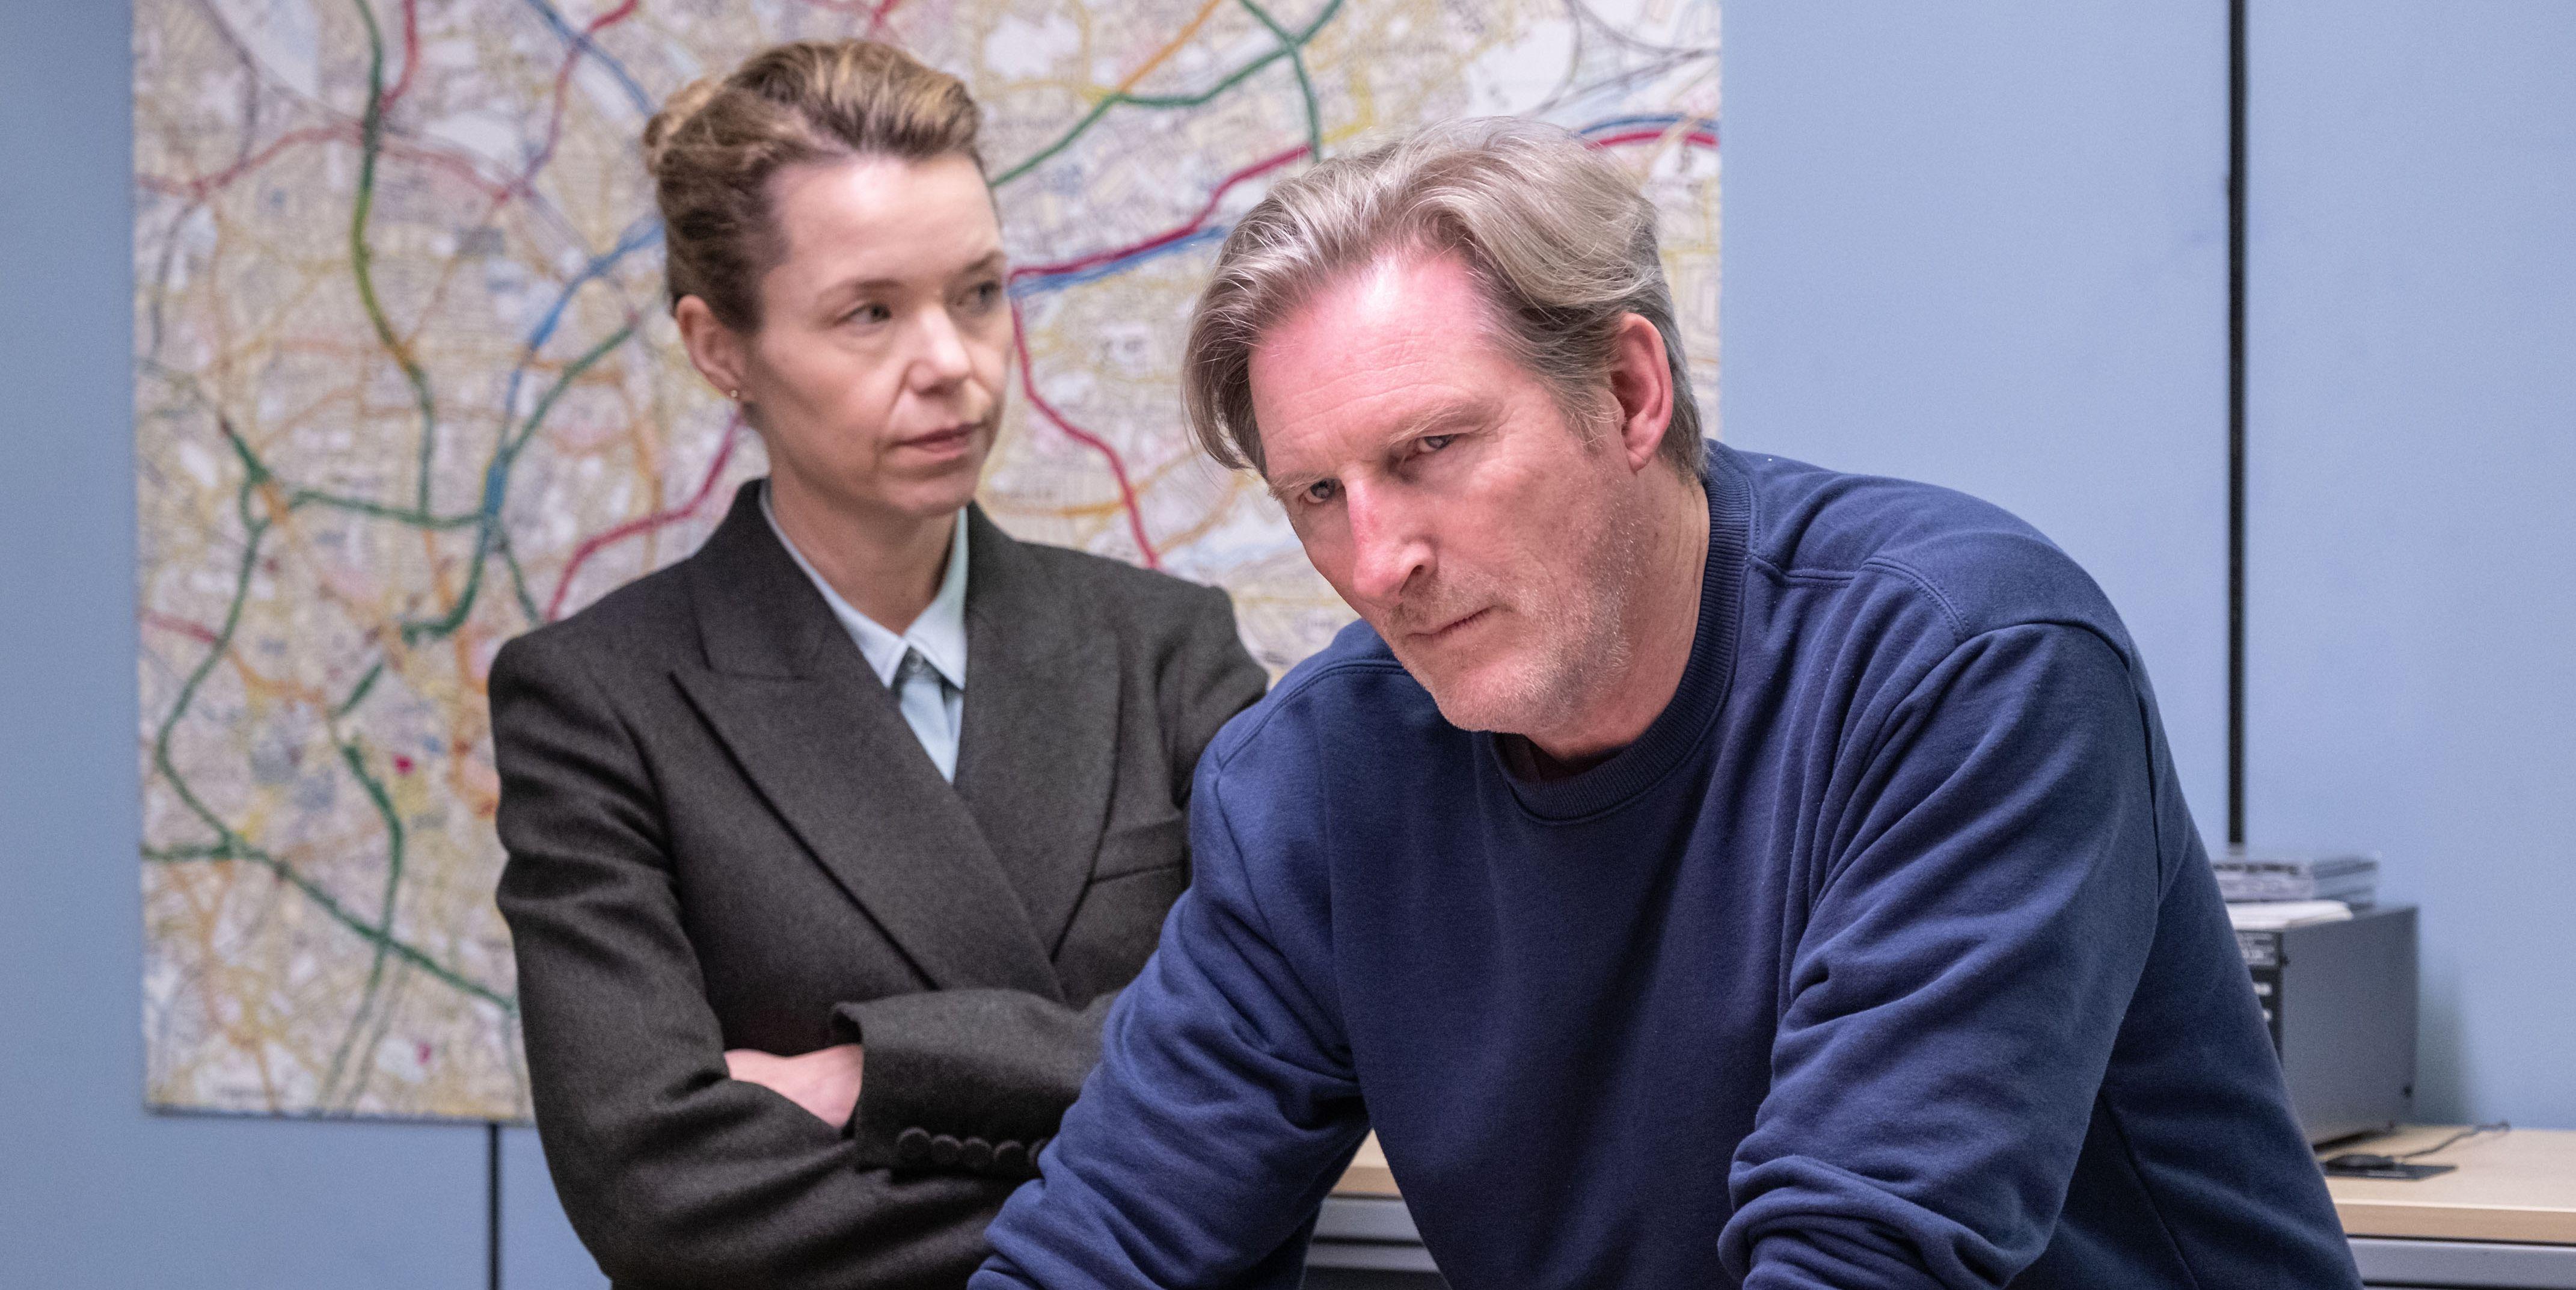 Carmichael (ANNA MAXWELL MARTIN), Hastings (ADRIAN DUNBAR) in Line of Duty season 5, episode 6